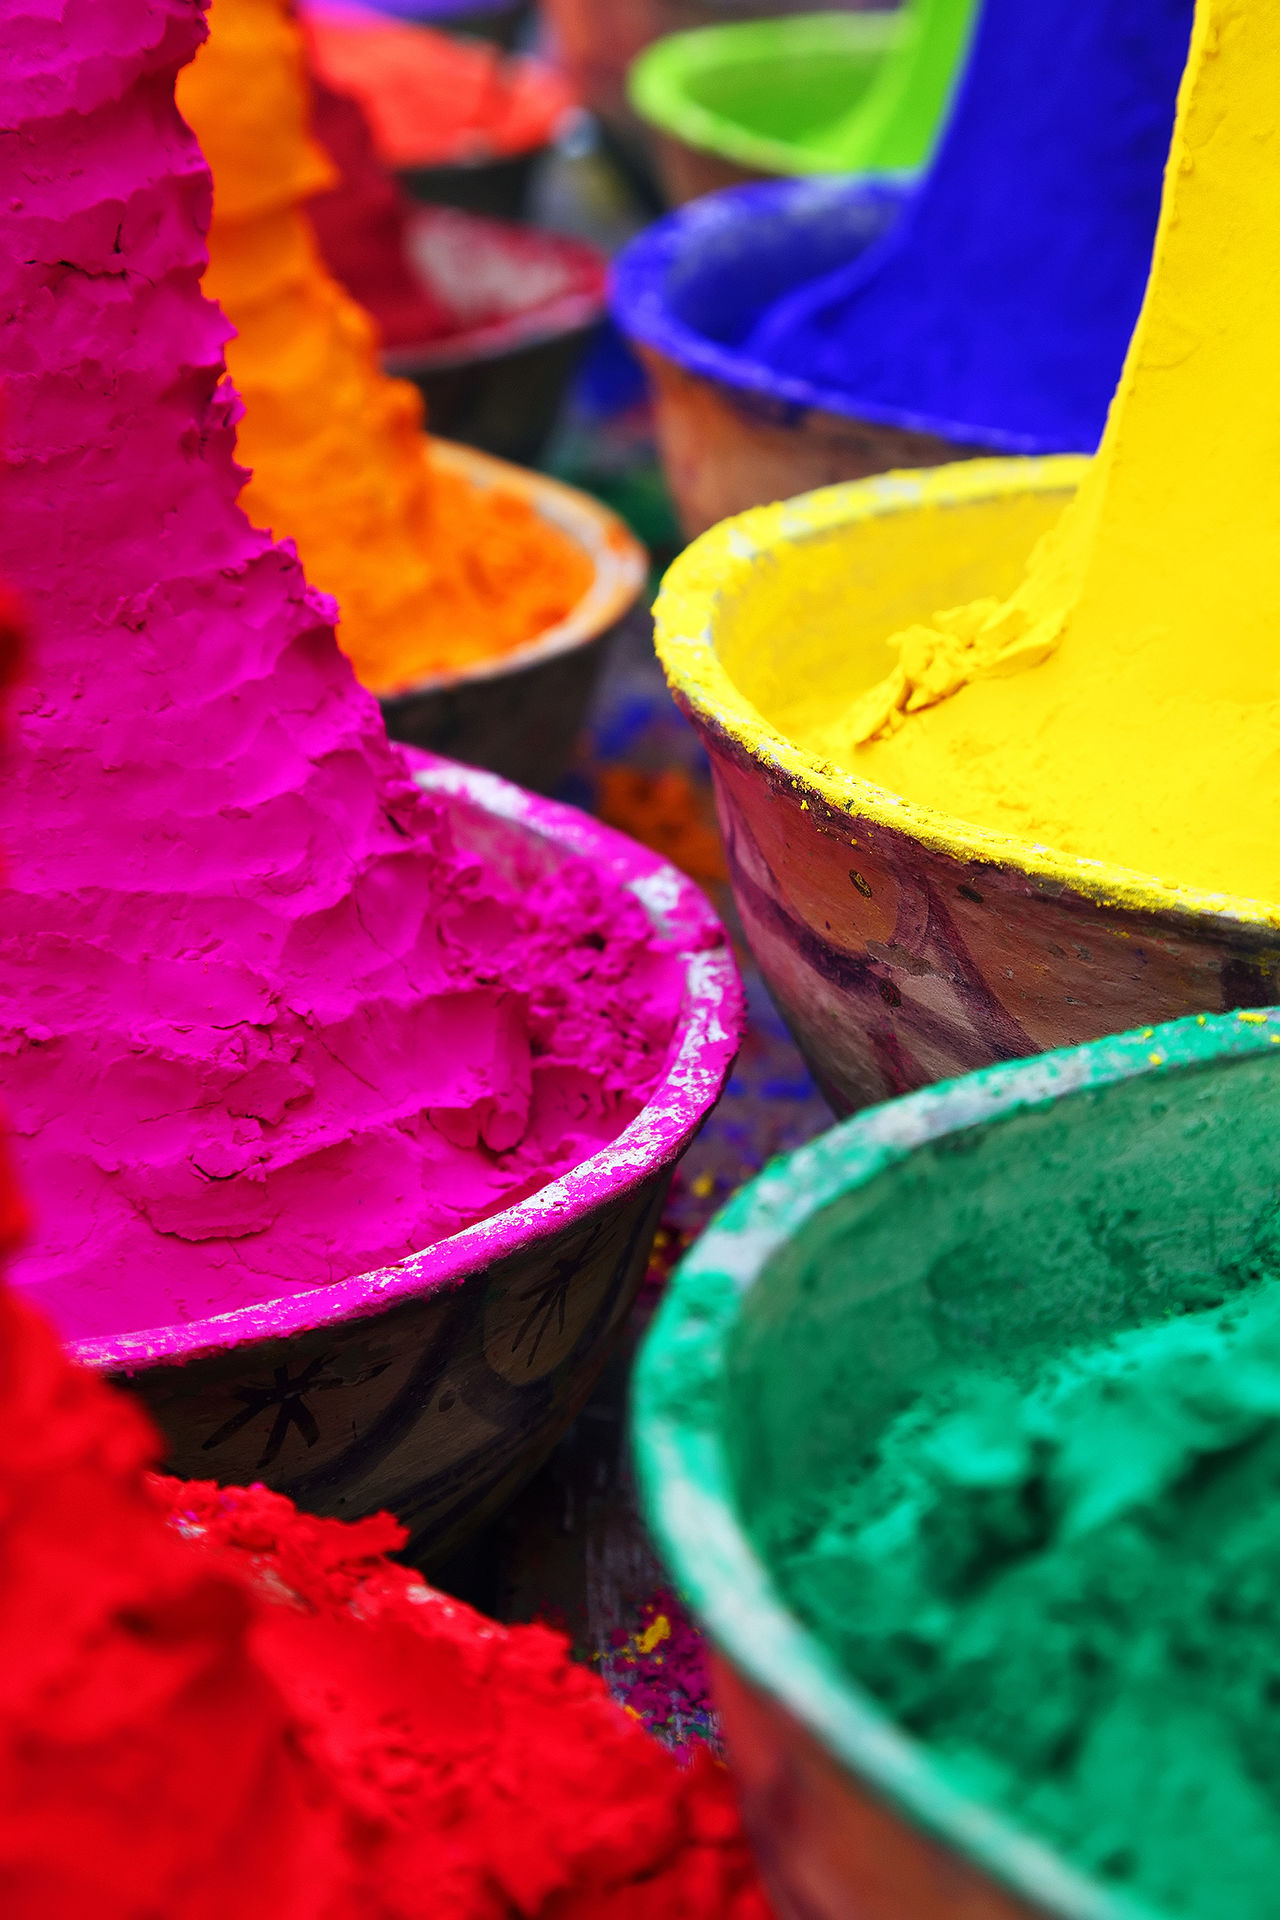 Craft Handmade India Market Multi Colored Objects Pushkar Rajasthan Textiles Travel Travel Destinations Travel Photography Valuable